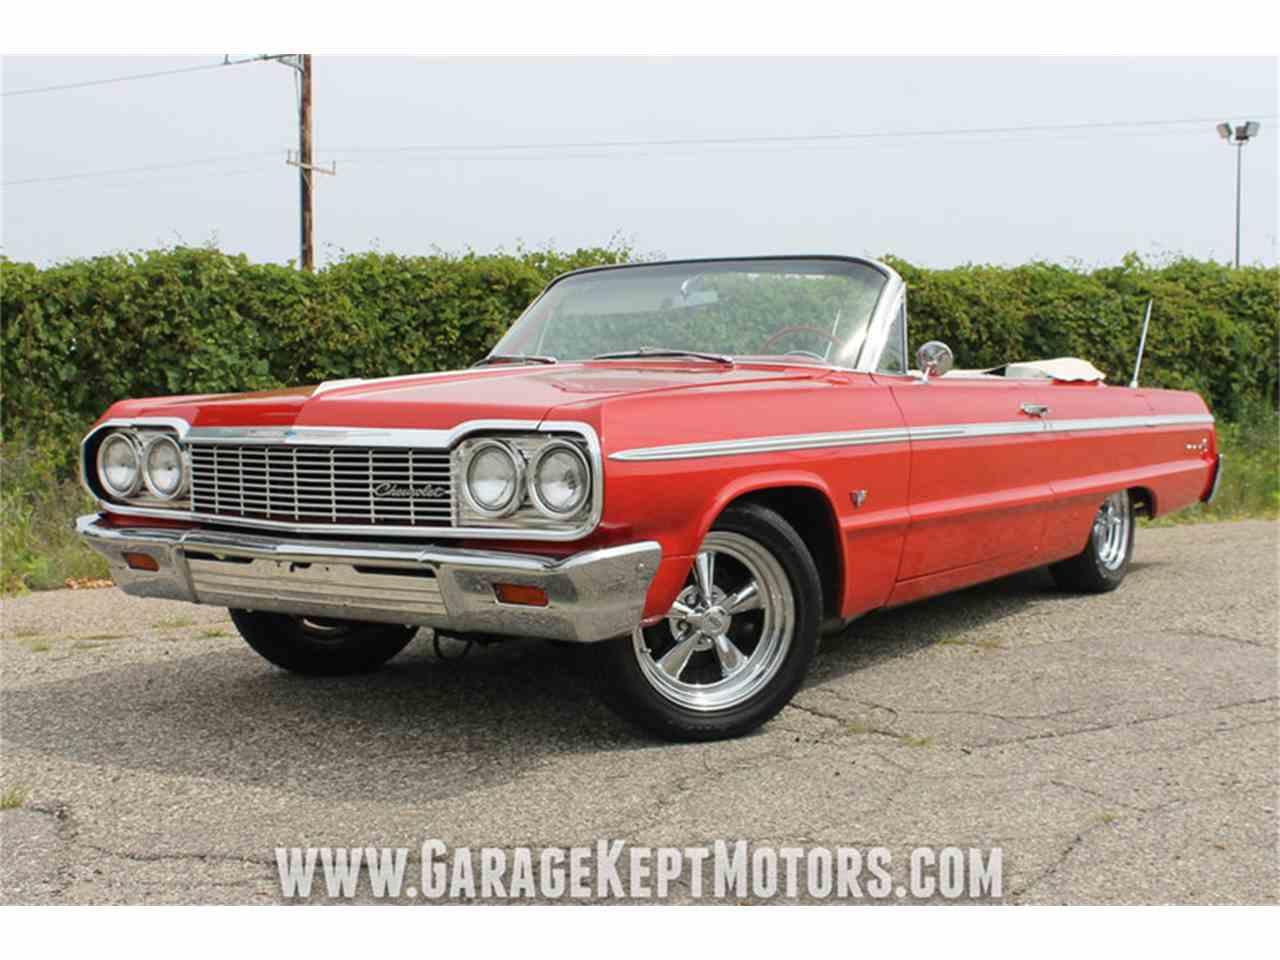 1964 chevrolet impala for sale cc 1008326. Black Bedroom Furniture Sets. Home Design Ideas